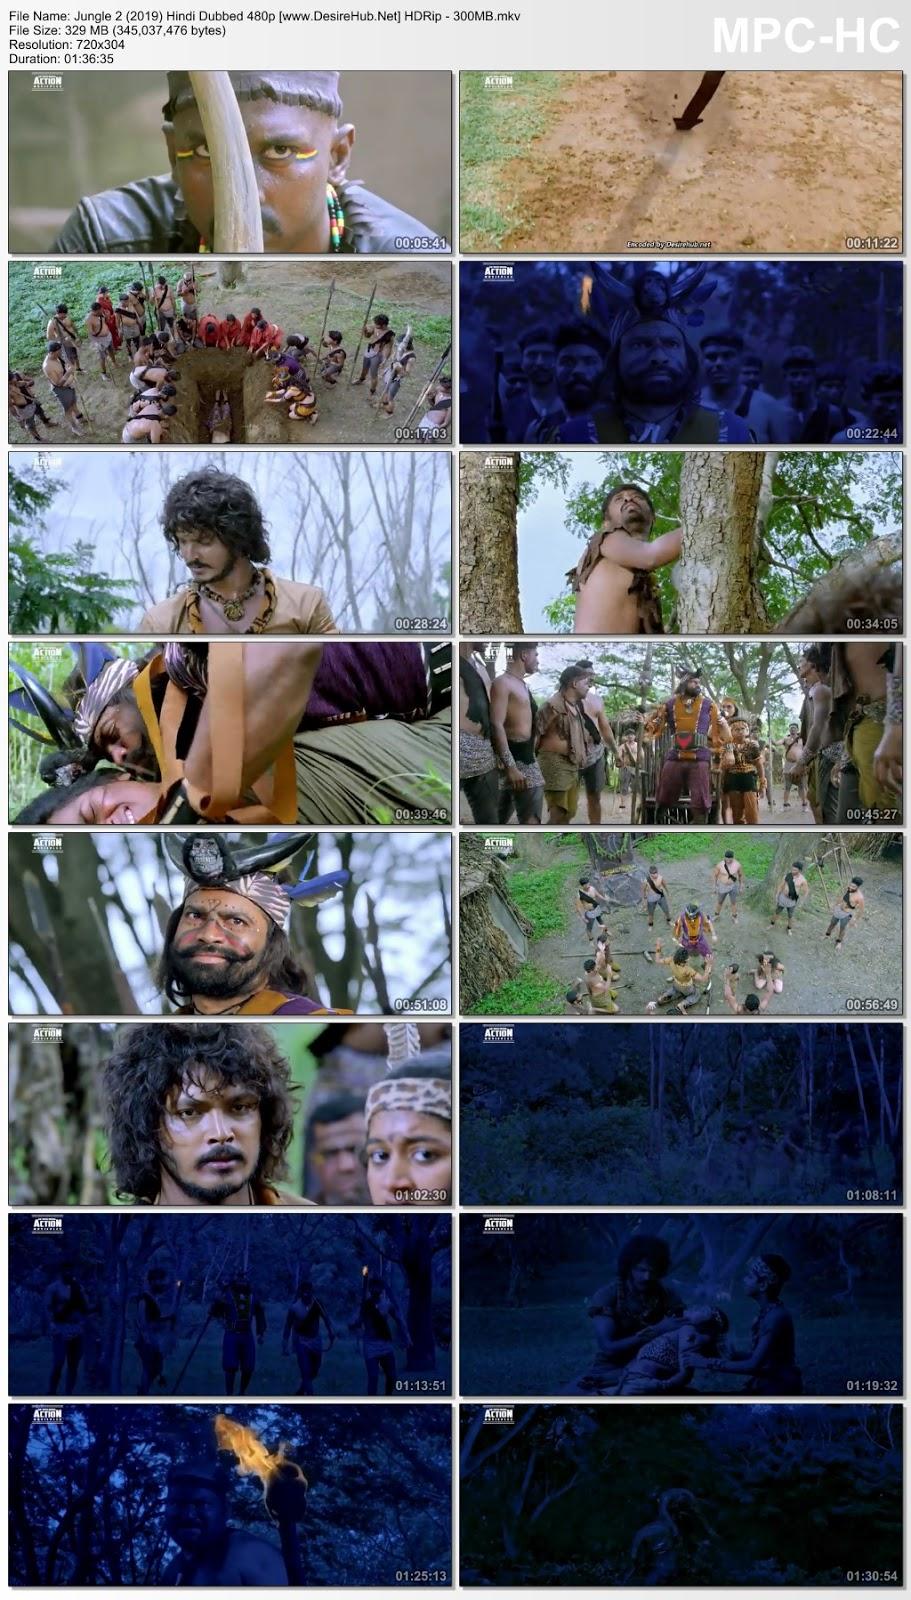 Jungle 2 (Birth) 2019 Hindi Dubbed 480p HDRip – 300MB Desirehub